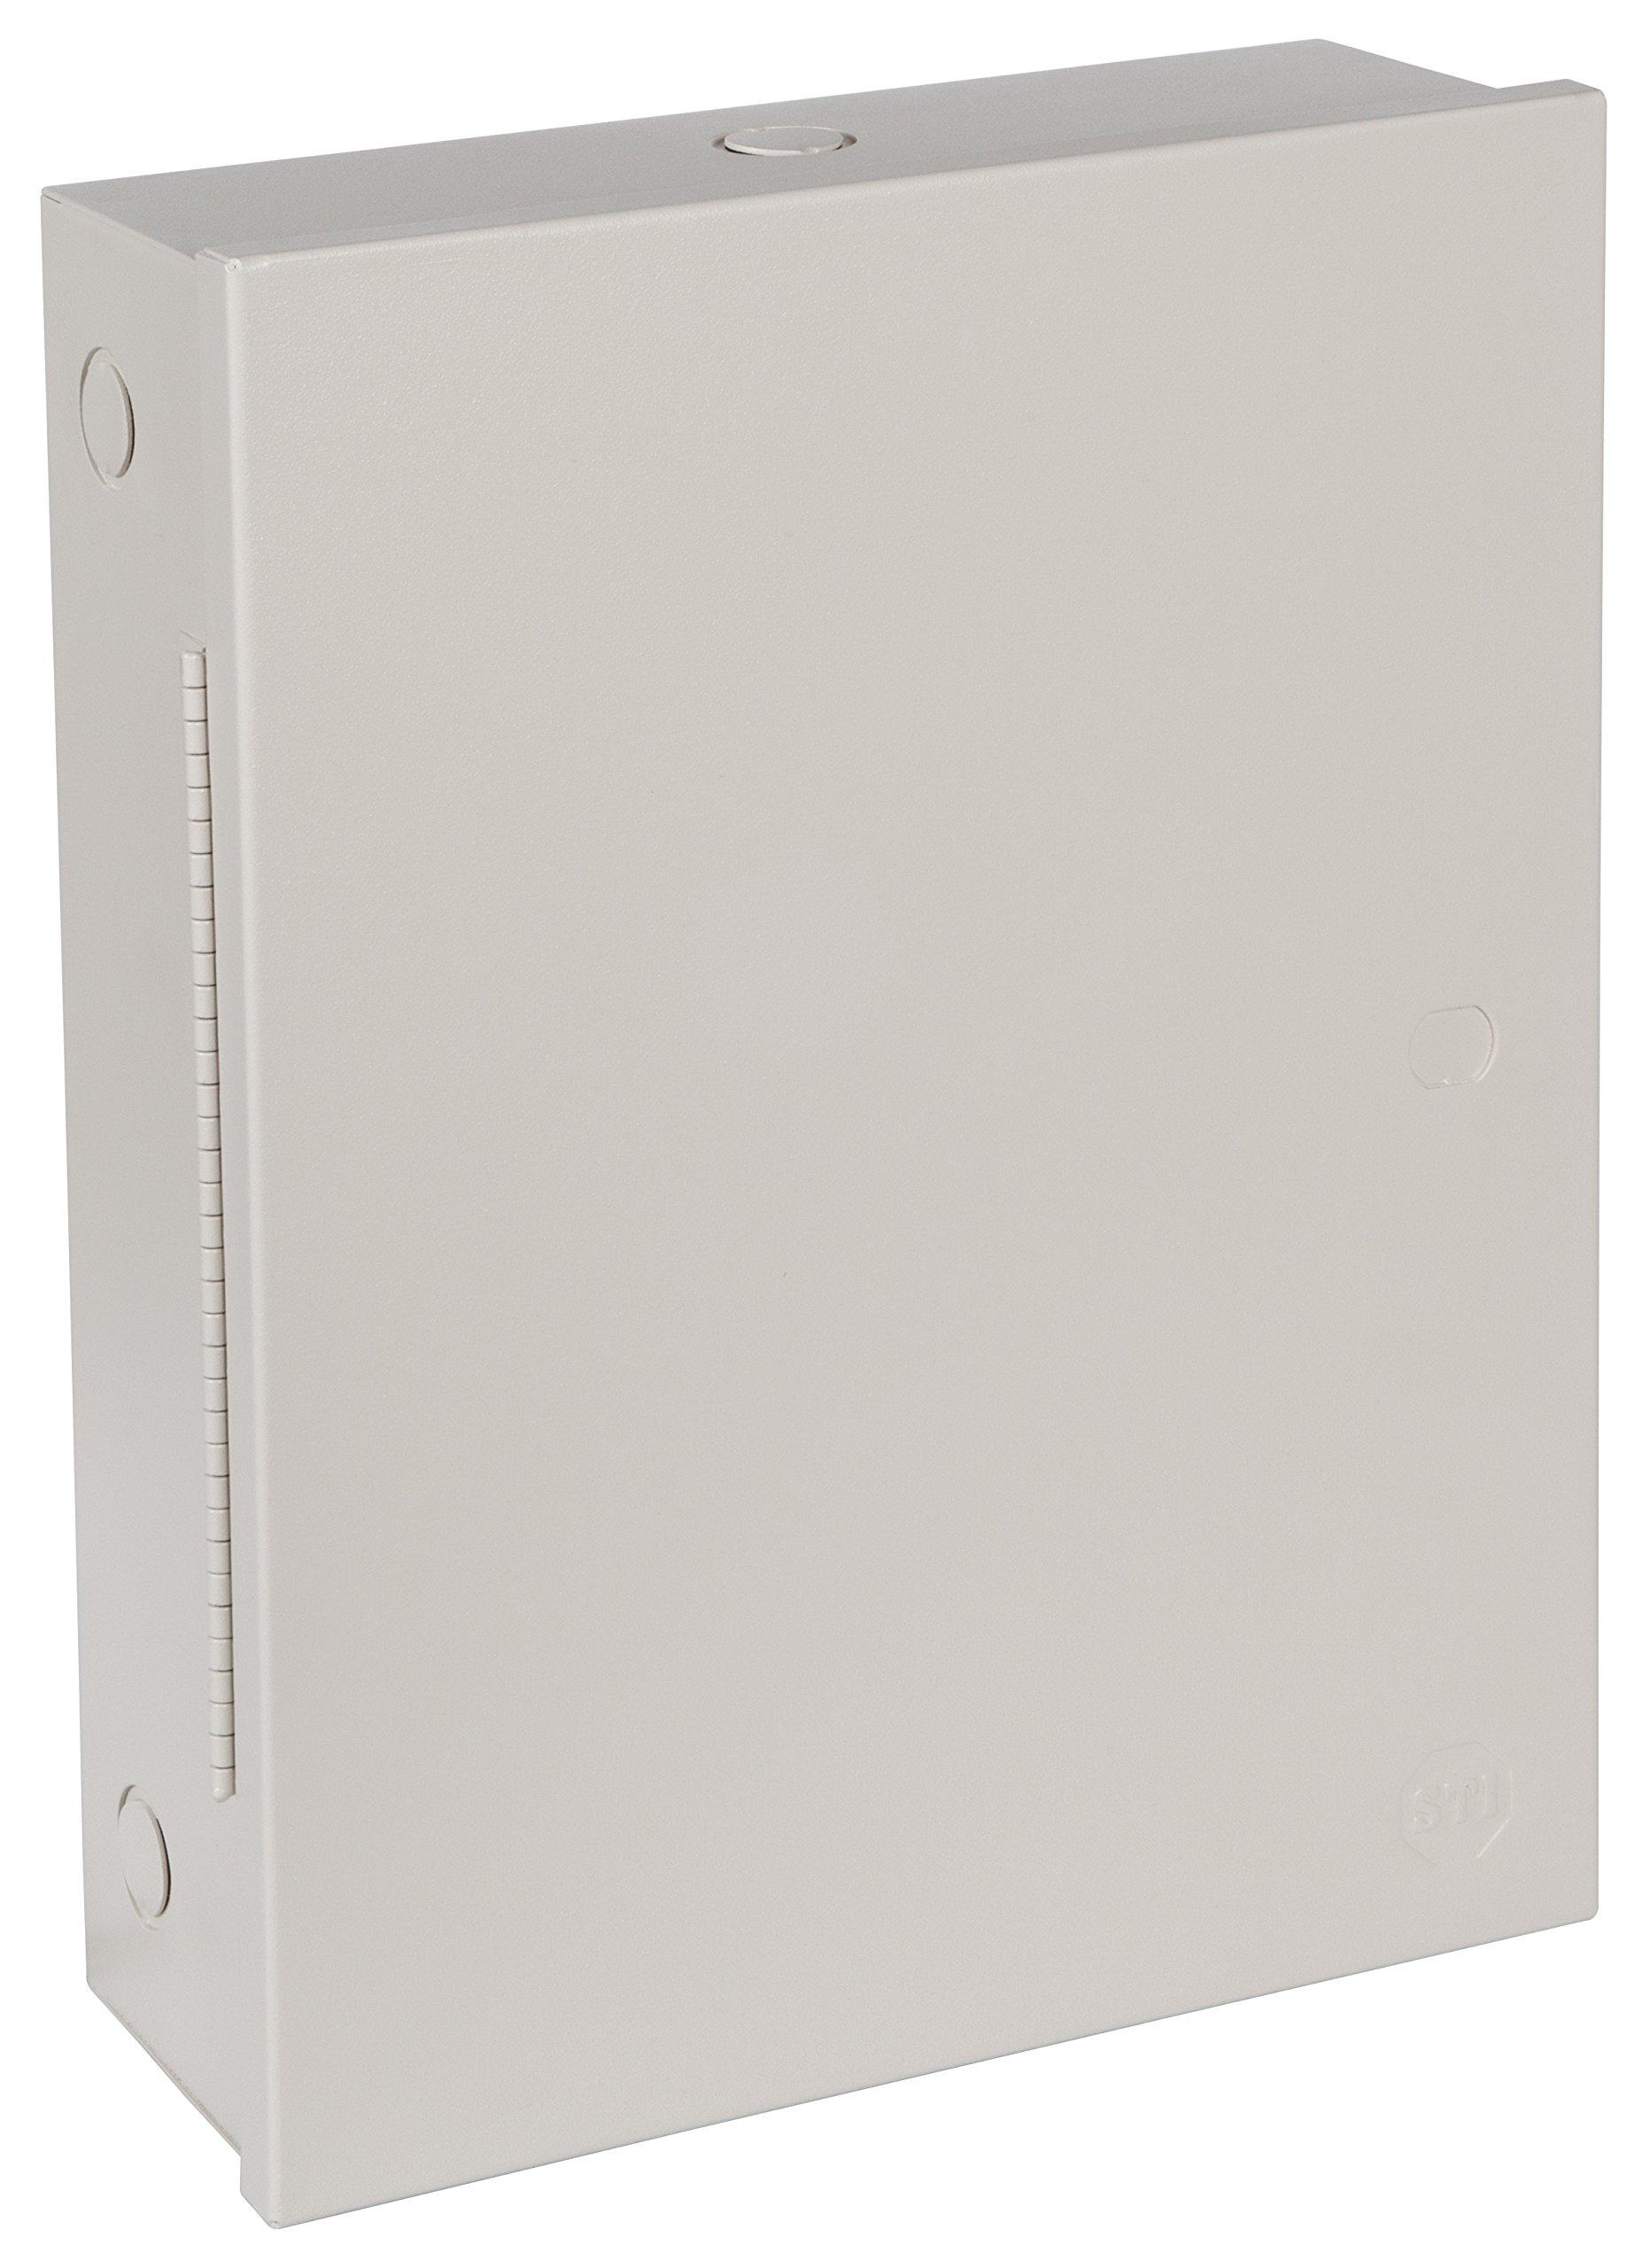 "Safety Technology International, Inc. STI-EM111504 Metal Protective Cabinet, UL/cUL Type1, Powder Coated, Piano Hinge, 11"" x 15"" x 4''"